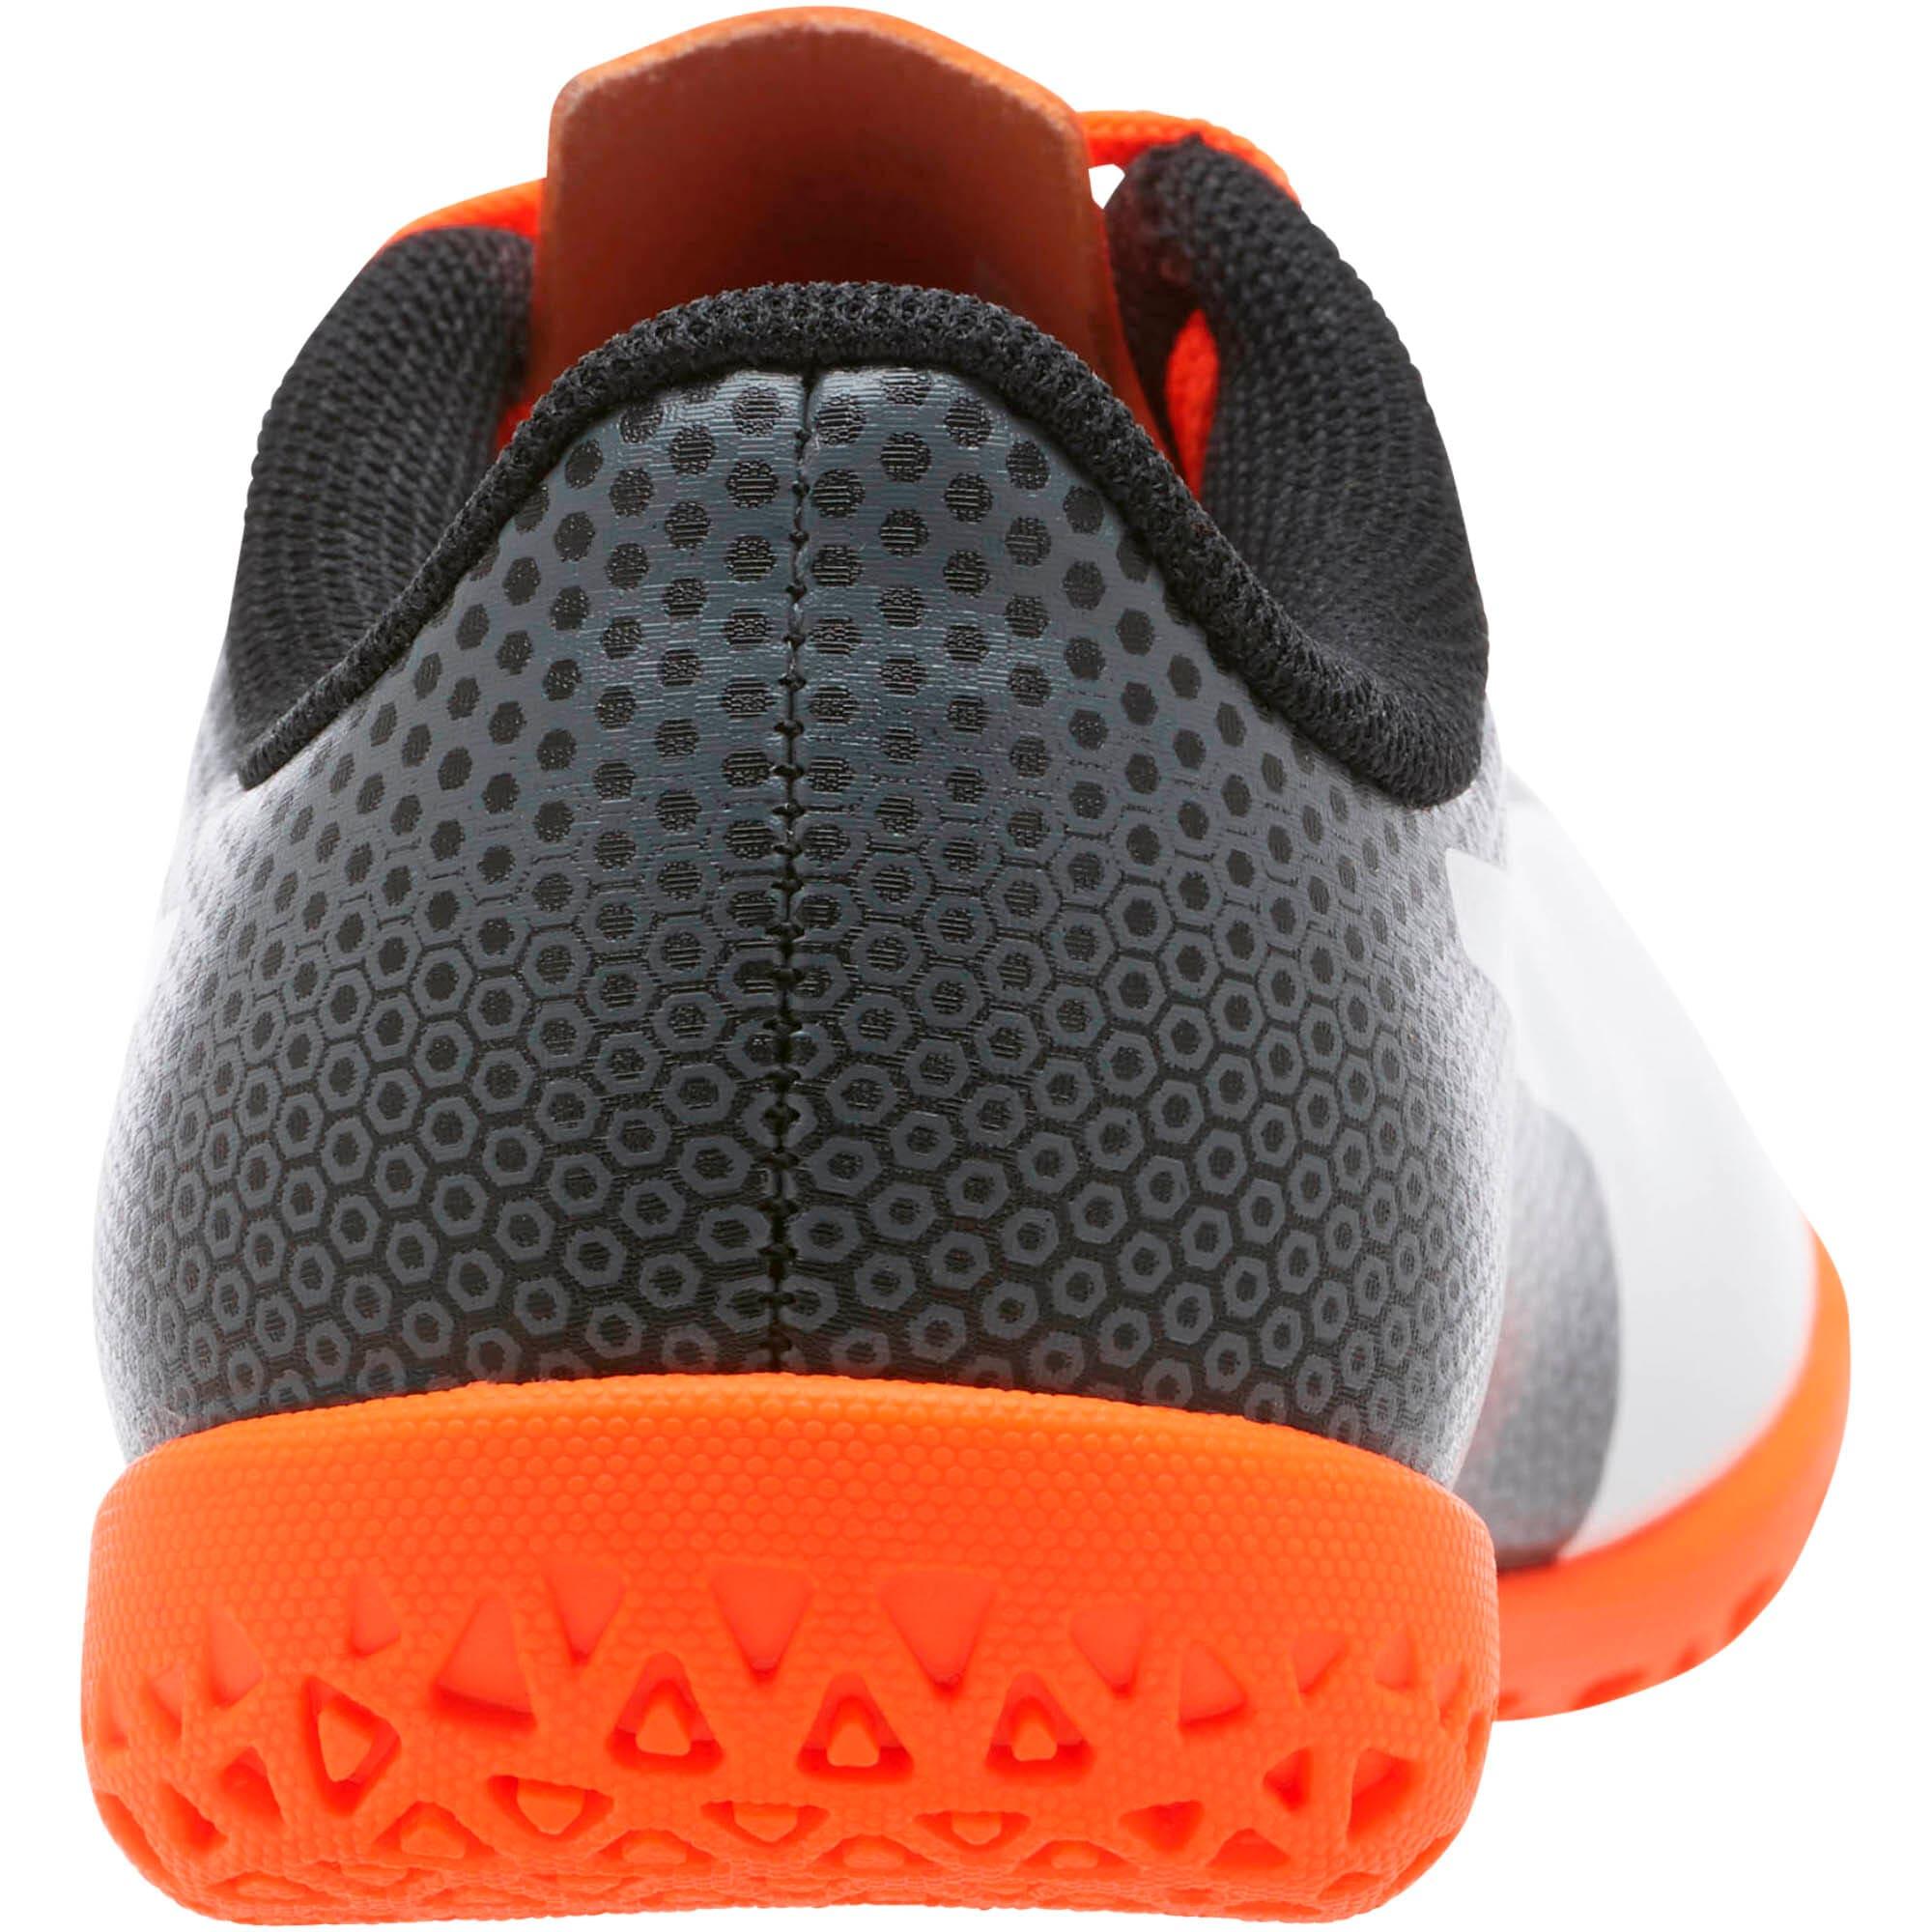 Thumbnail 4 of PUMA Spirit IT Soccer Shoes JR, Black-White-Orange, medium